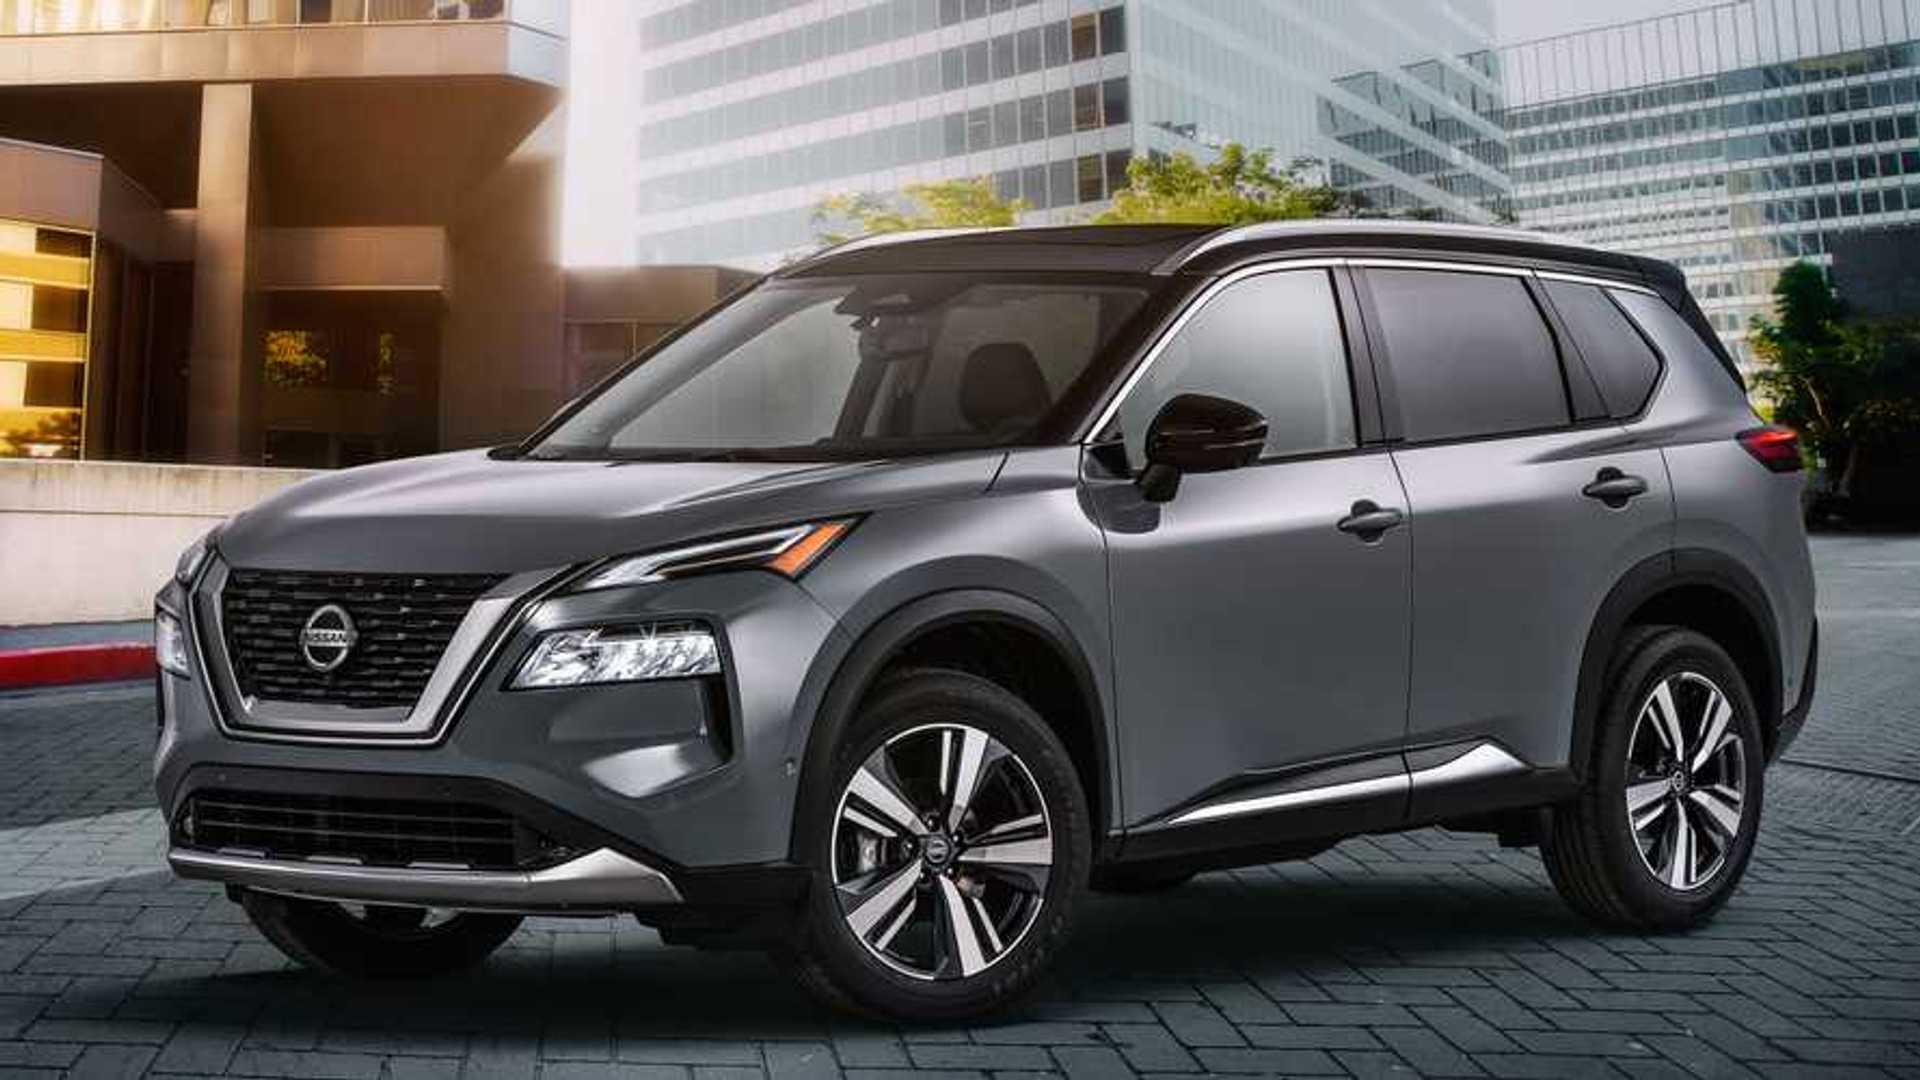 2021 Nissan Rogue Redesign Emphasizes Tech, Versatility